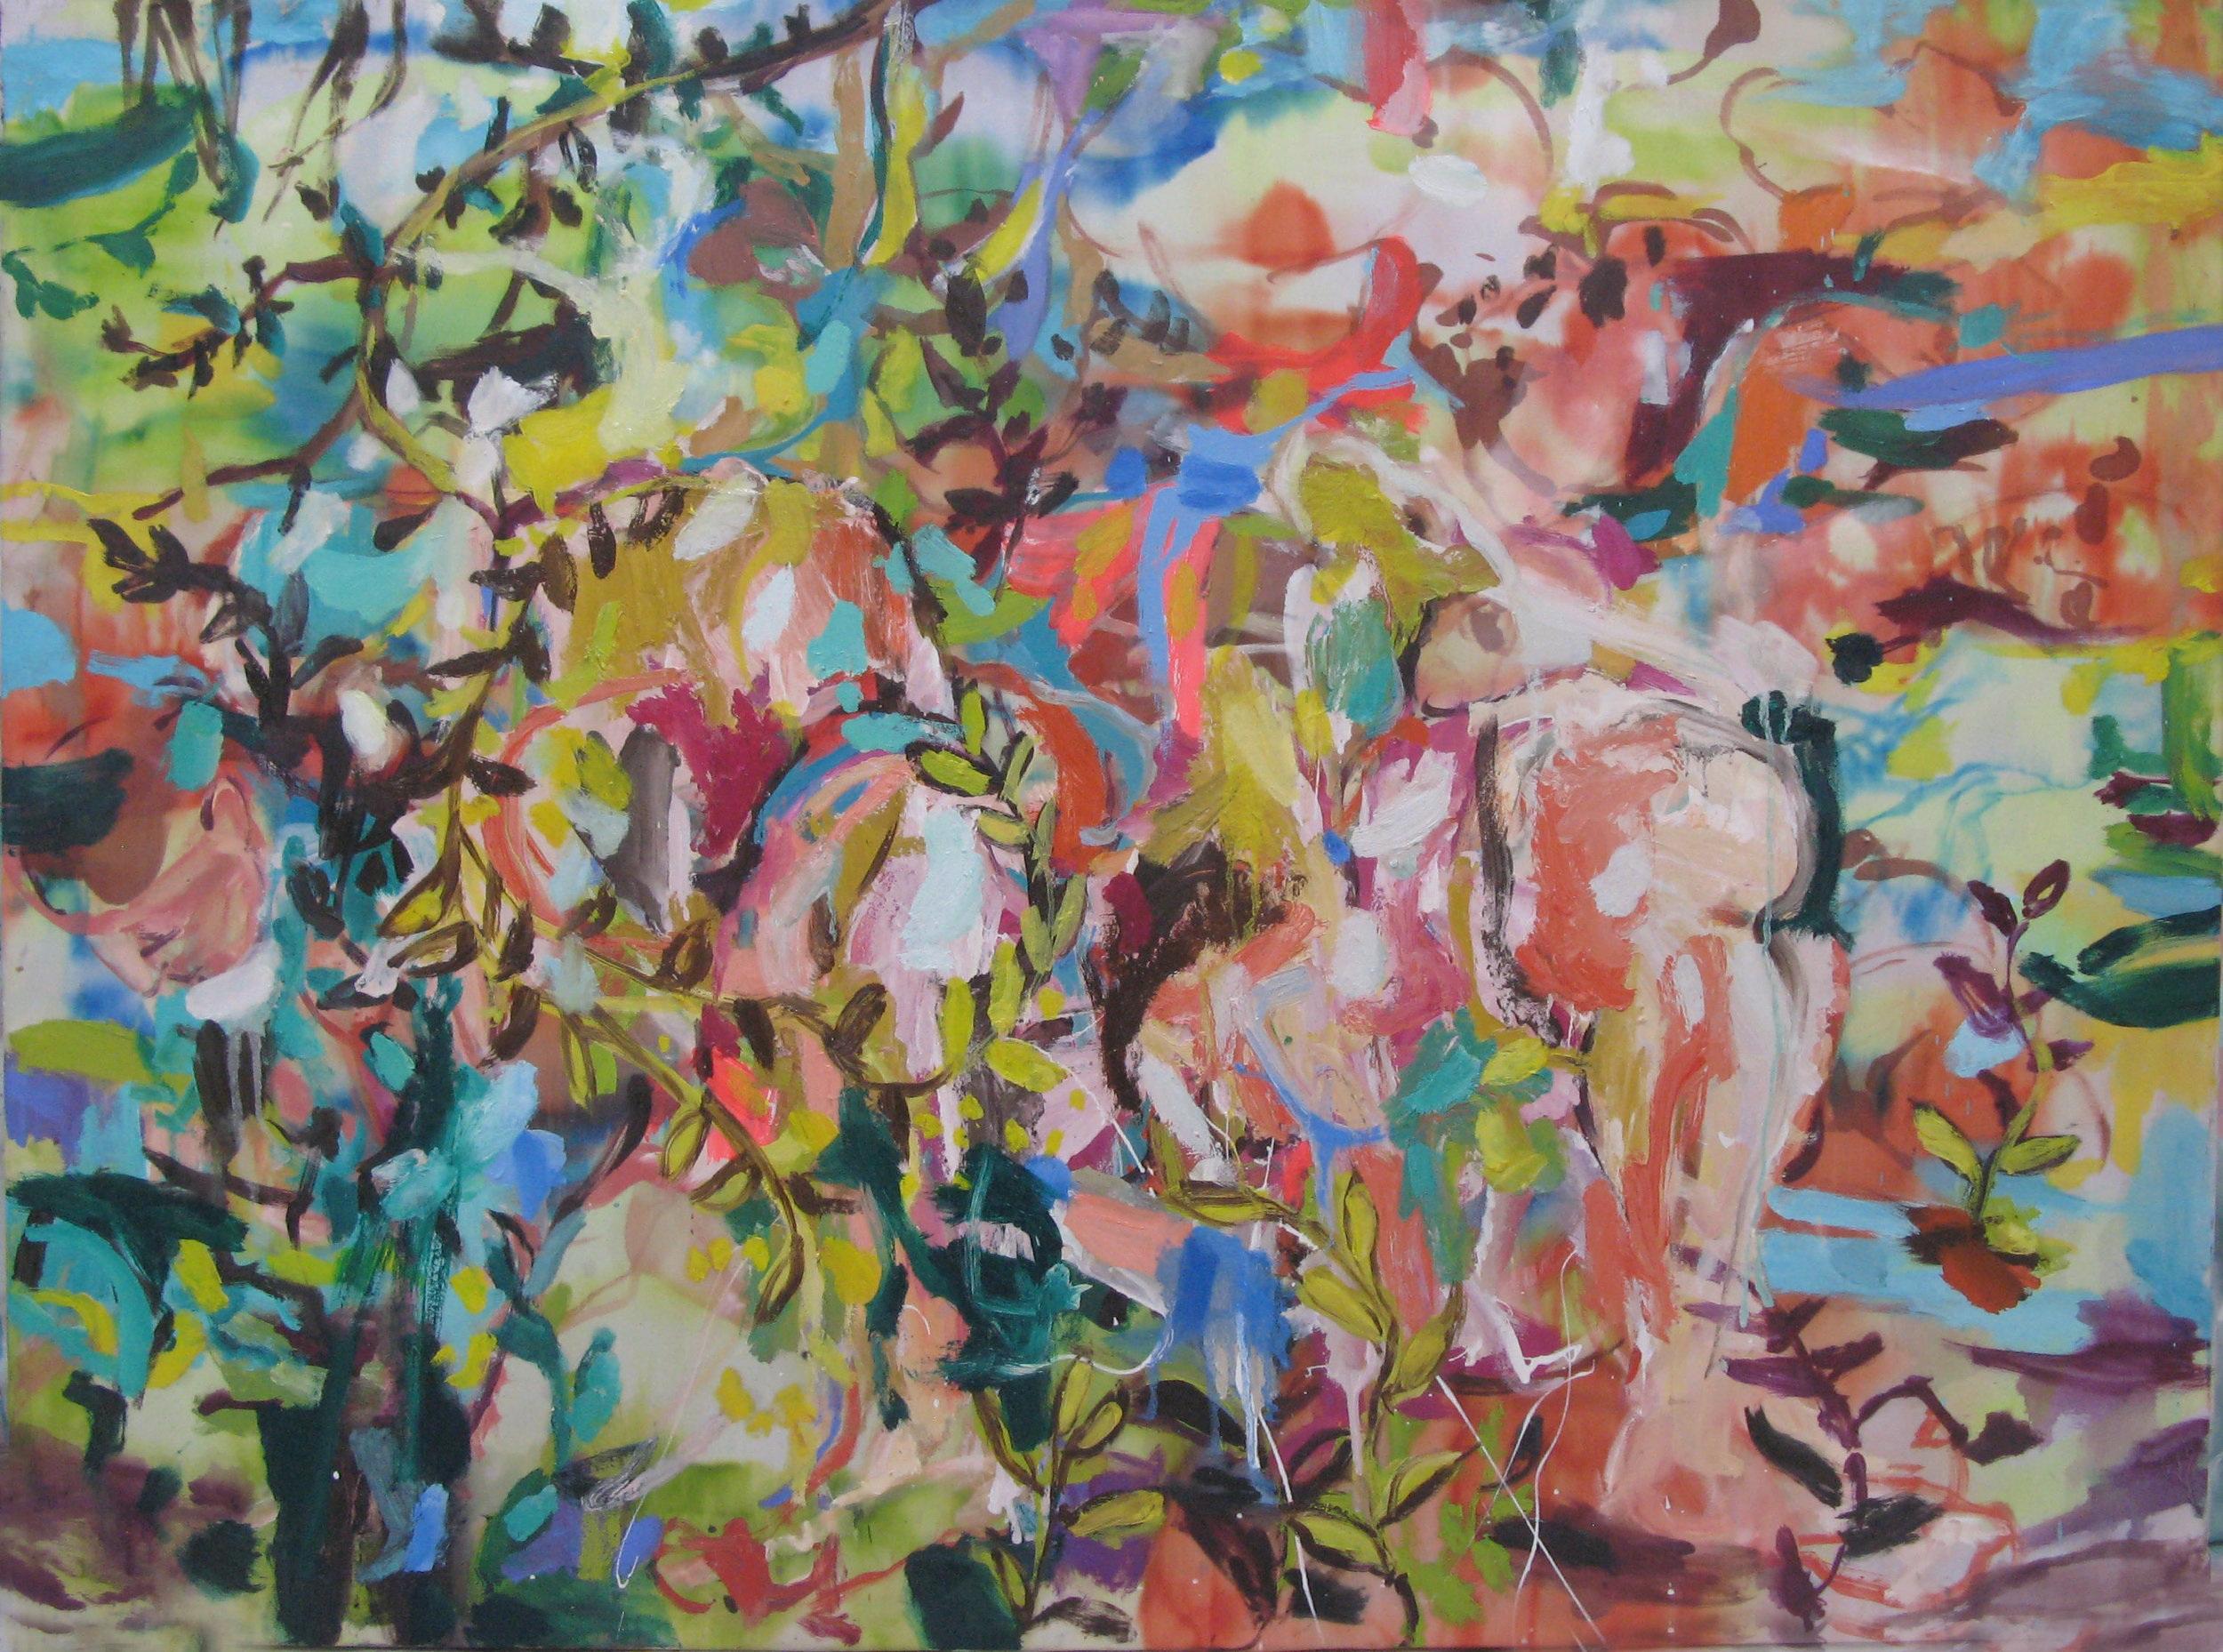 Agata_di_Masternak_I120x90cm%2C+mixed+media+on+silk%2C+d+-life+tapestries%2C120x90cm-HOspital+Club.jpg